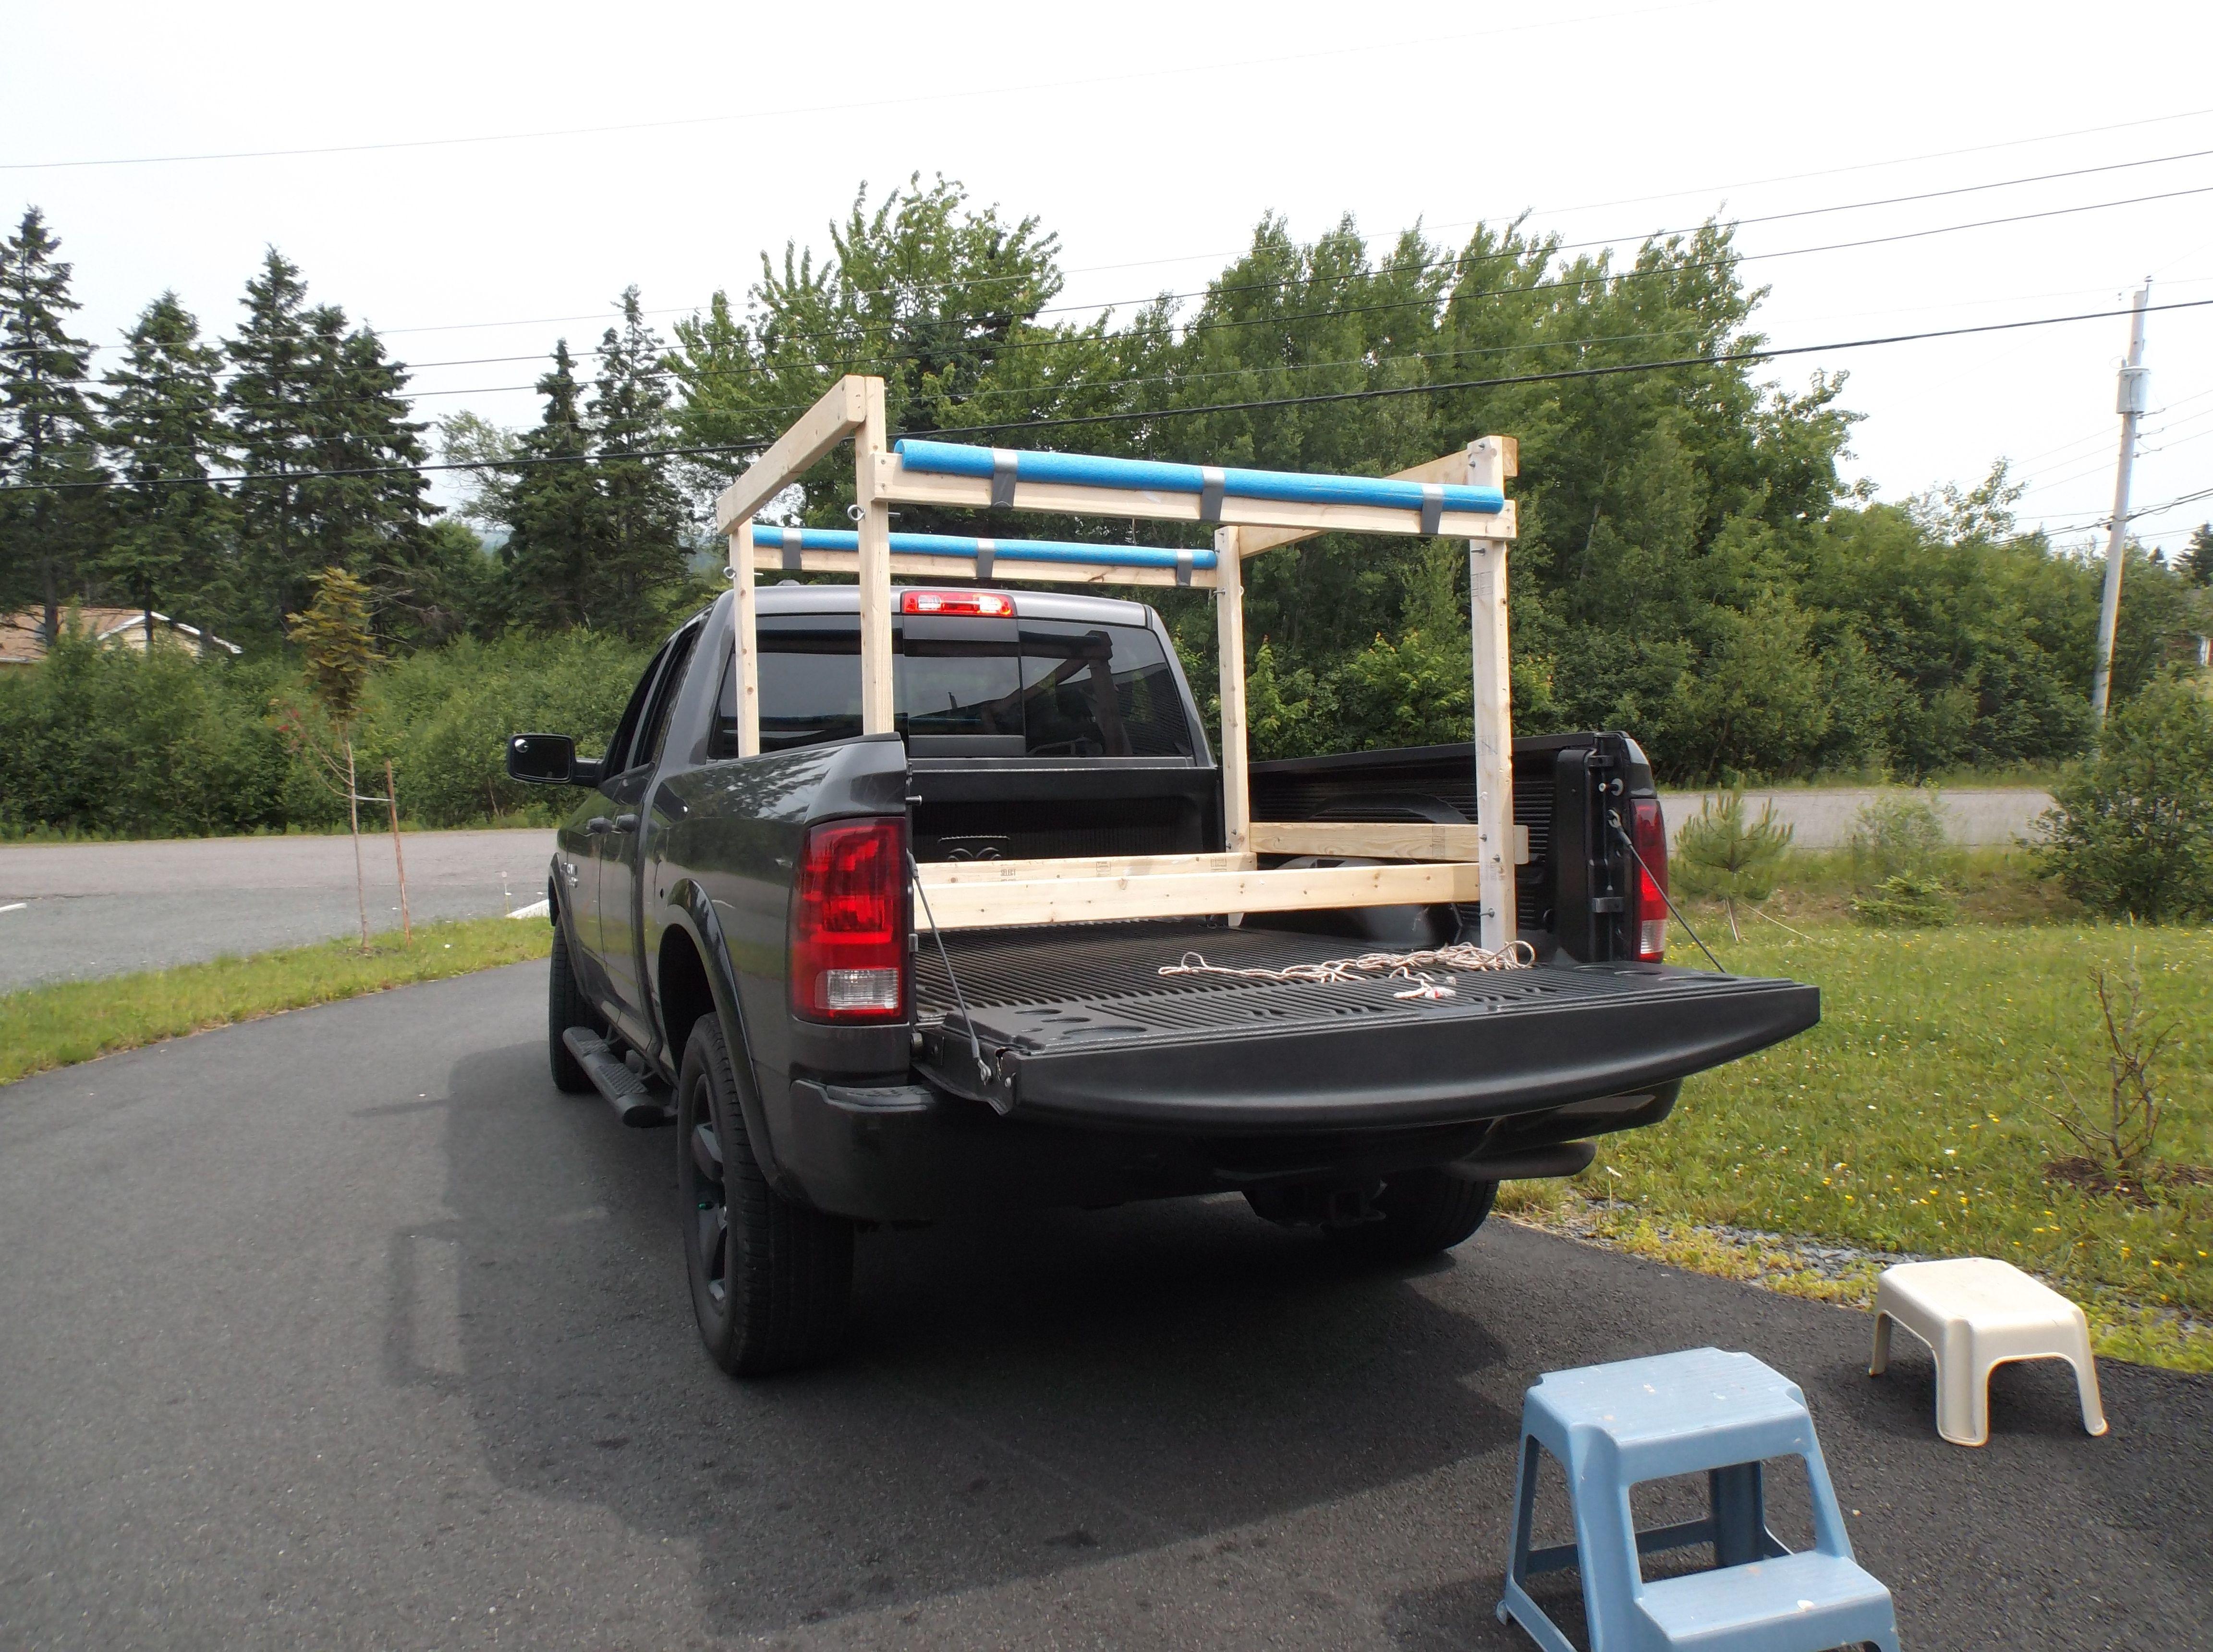 so needed car album for i x my truck trucks carriers roof one rack bike a kayak imgur racks and built